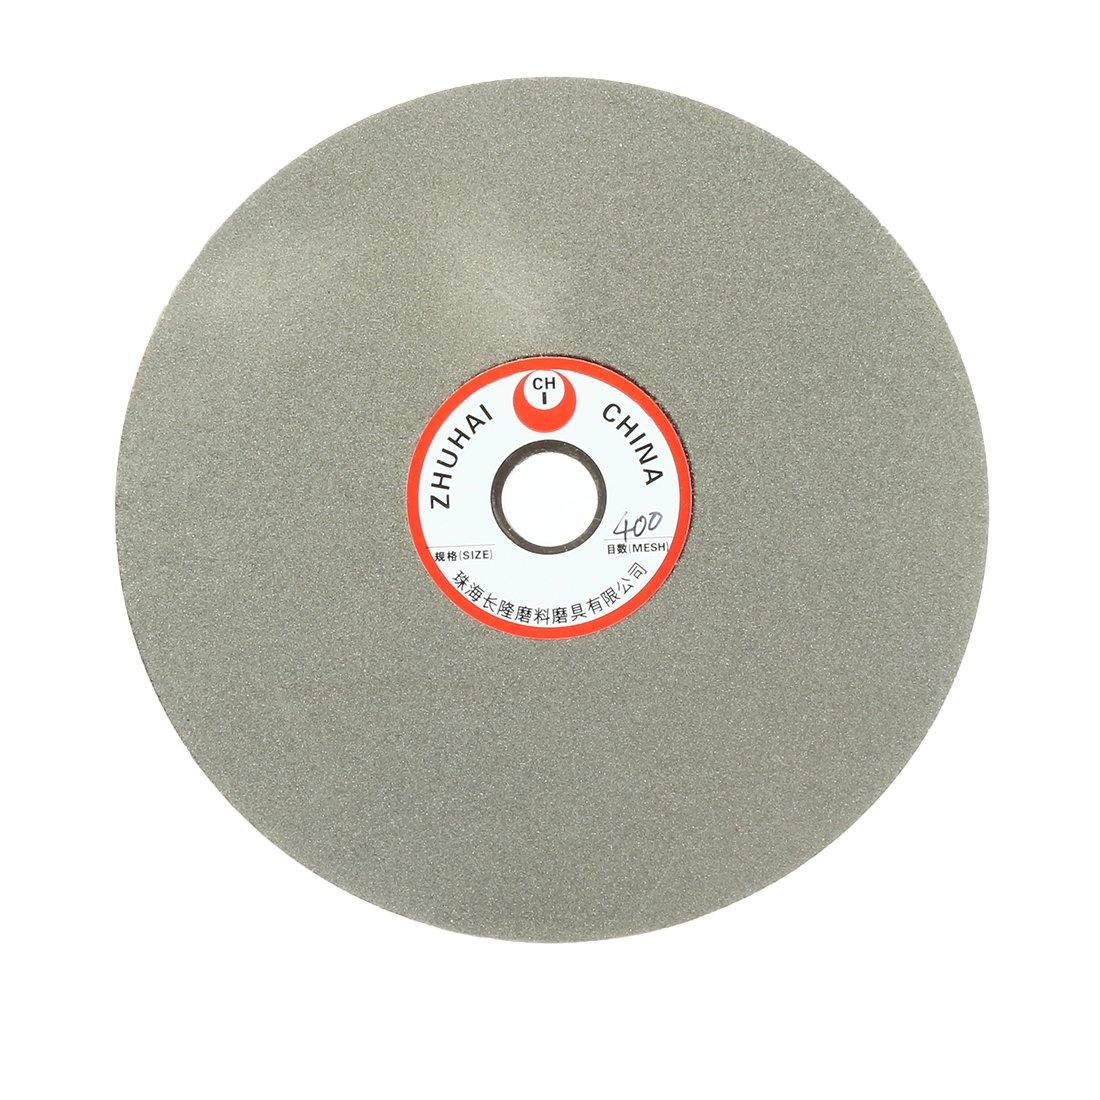 uxcell 6-inch Grit 400 Diamond Coated Flat Lap Wheel Grinding Disc Polishing Tool